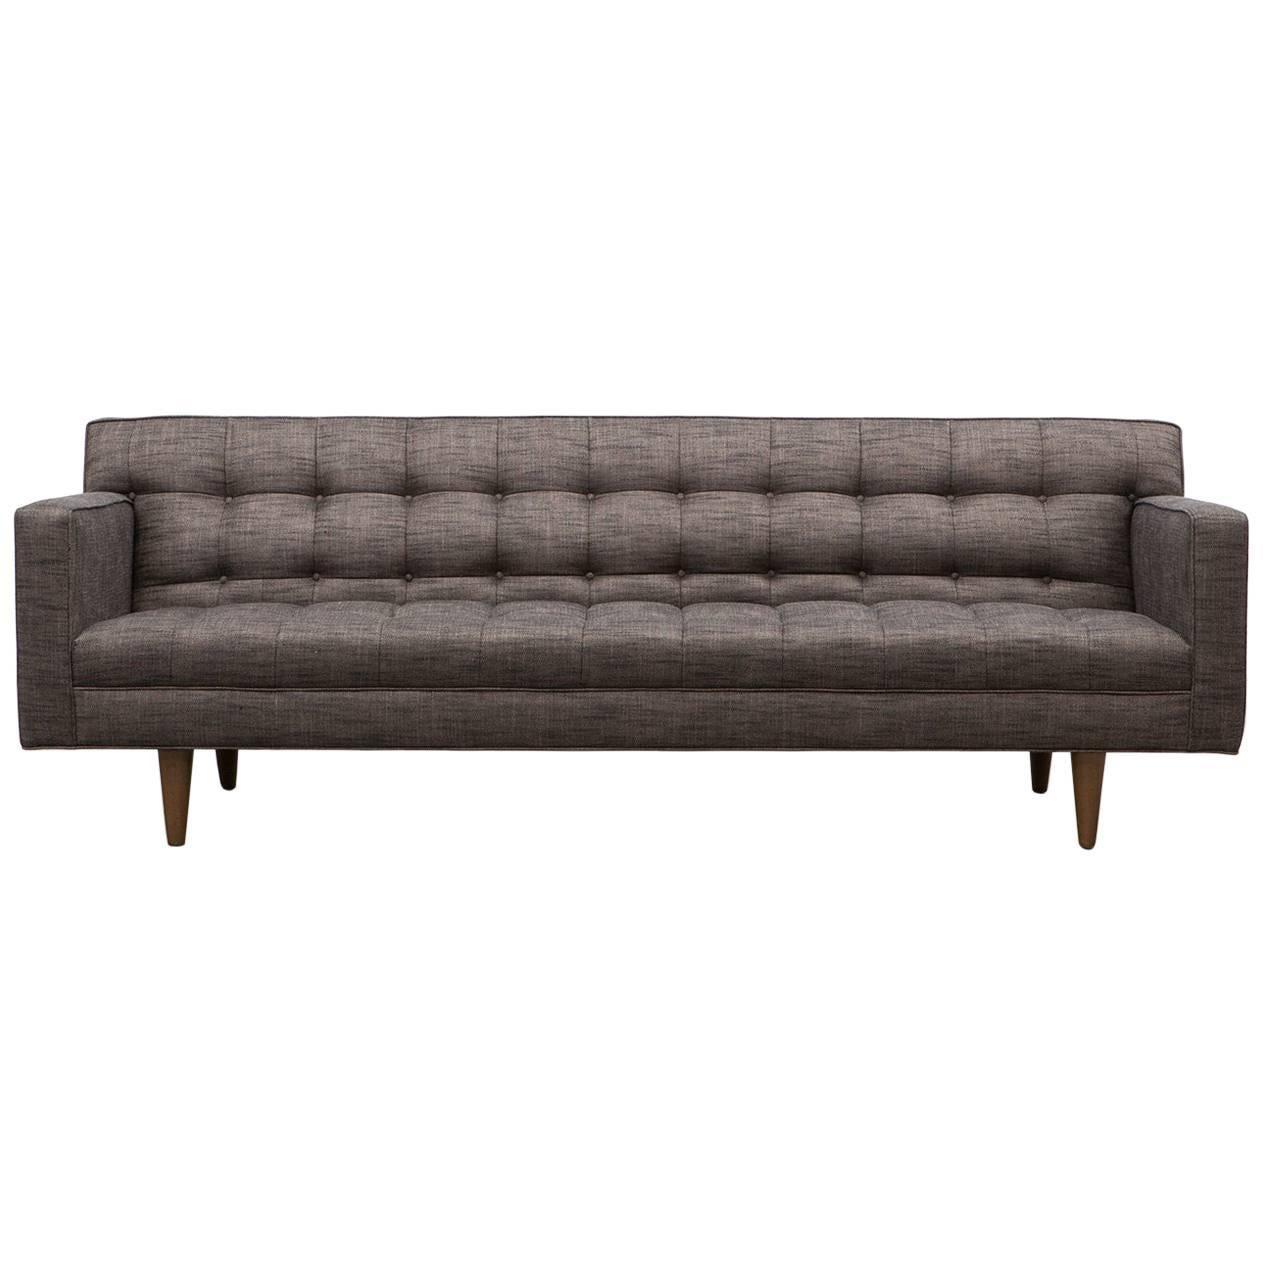 Edward Wormley Sofa 'b' New Upholstery